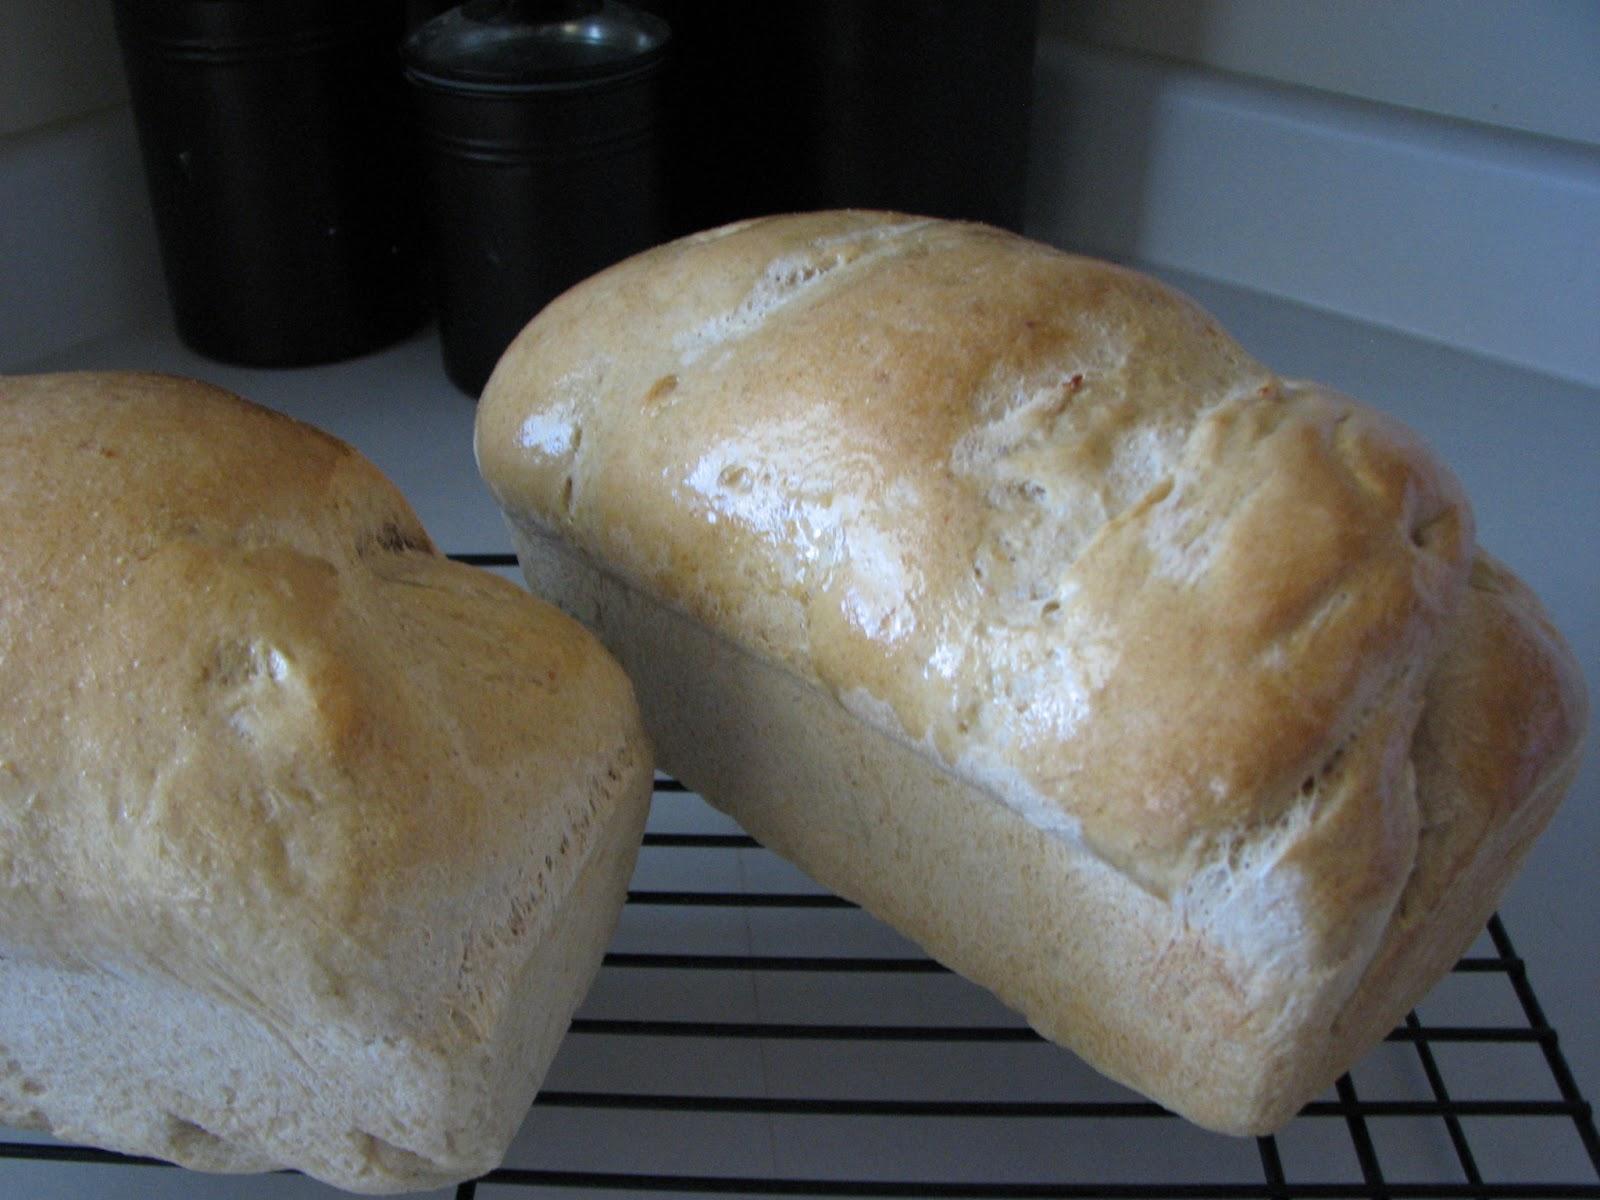 dough kneading machine walmart